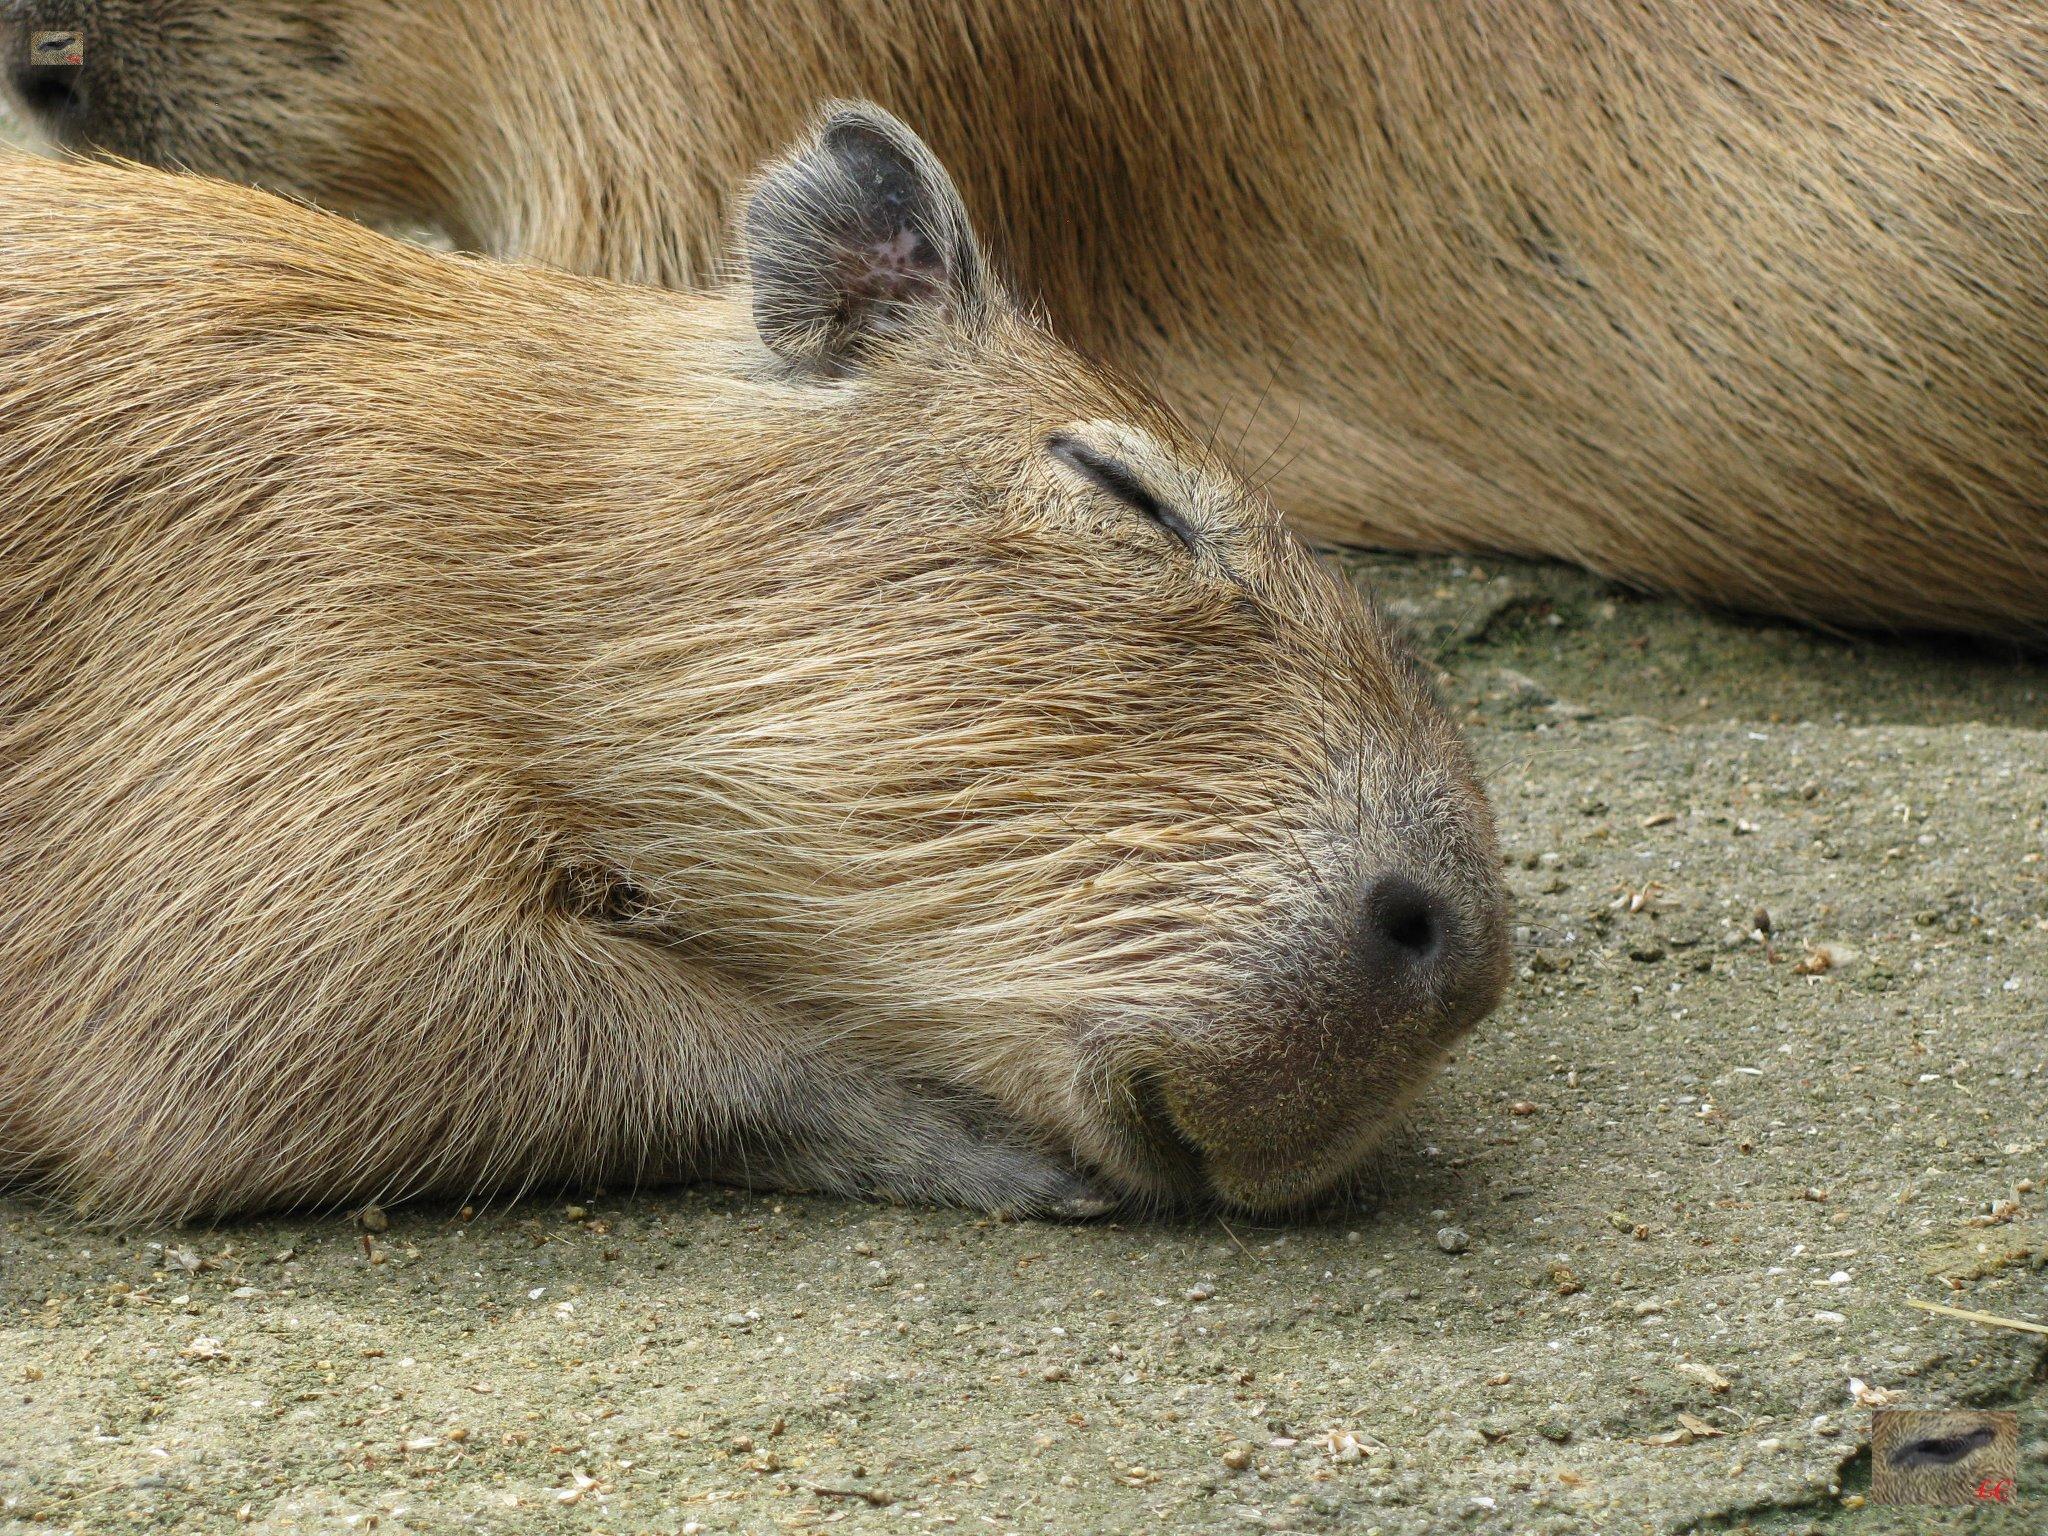 Little Baby Io Dreaming リトルベイビーイオドリーミング